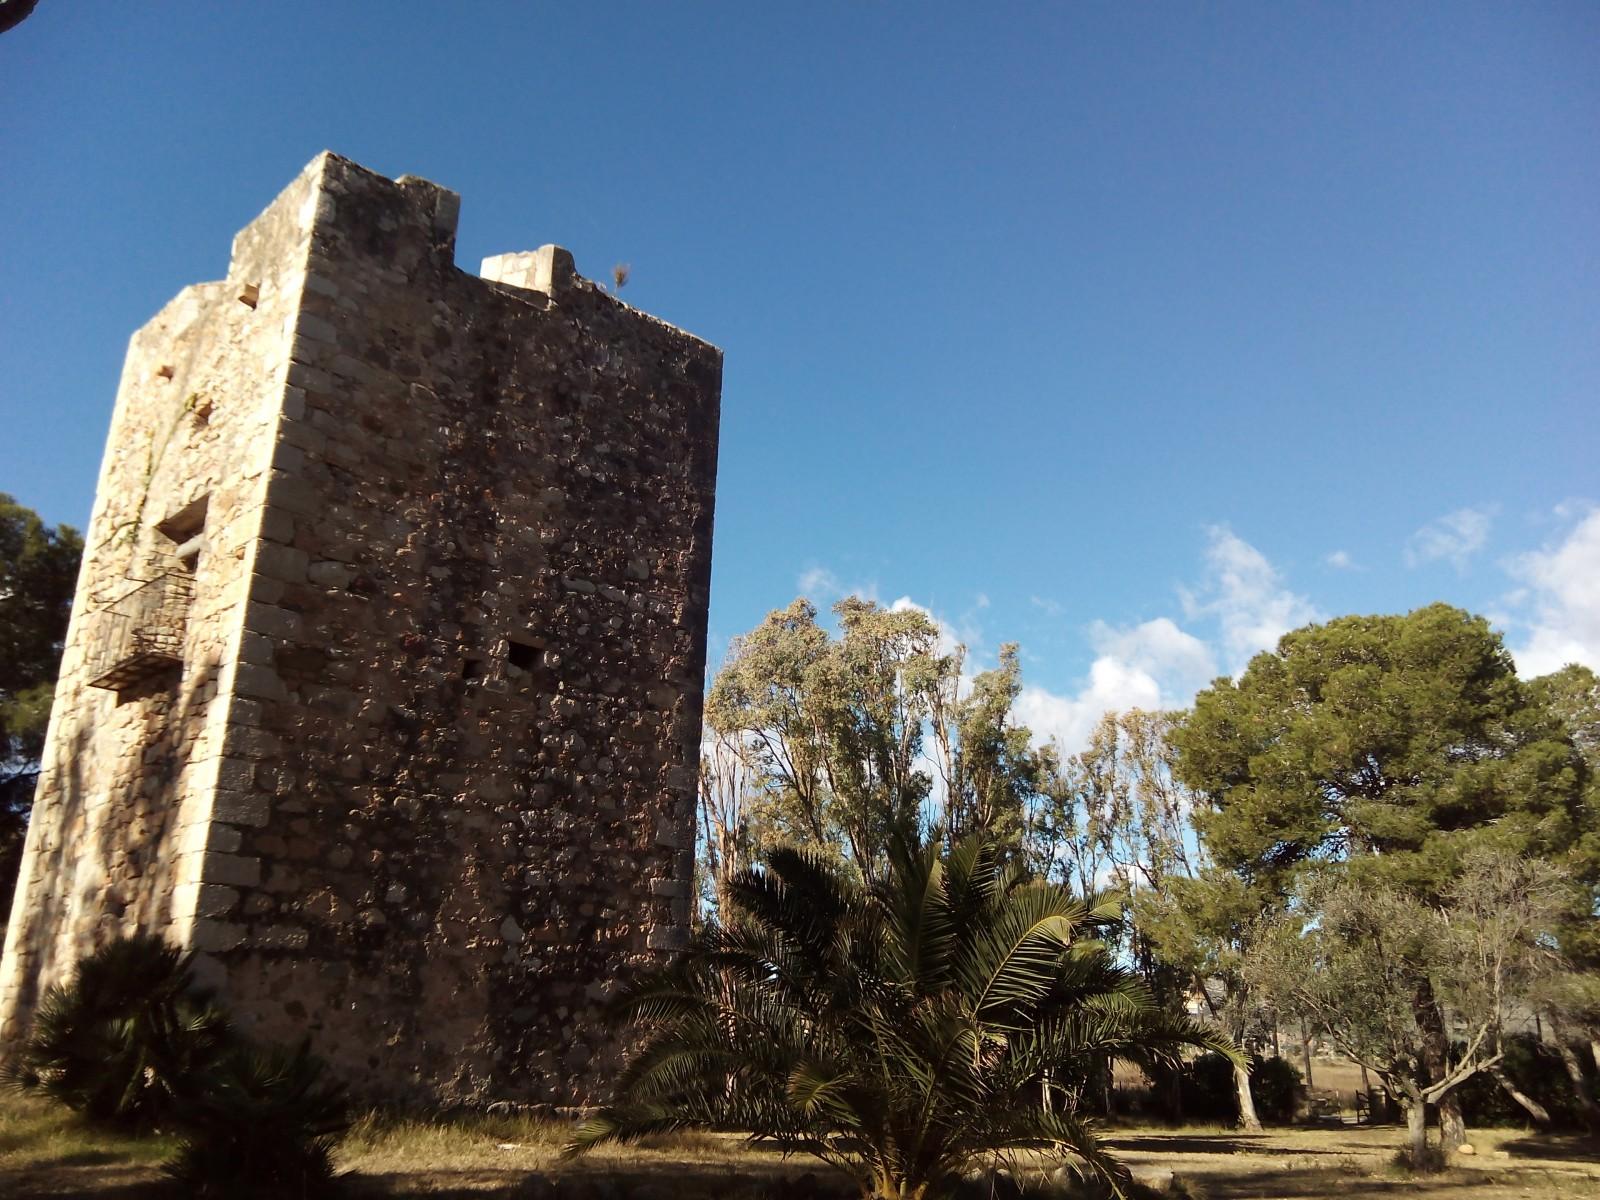 Torre-la-sal